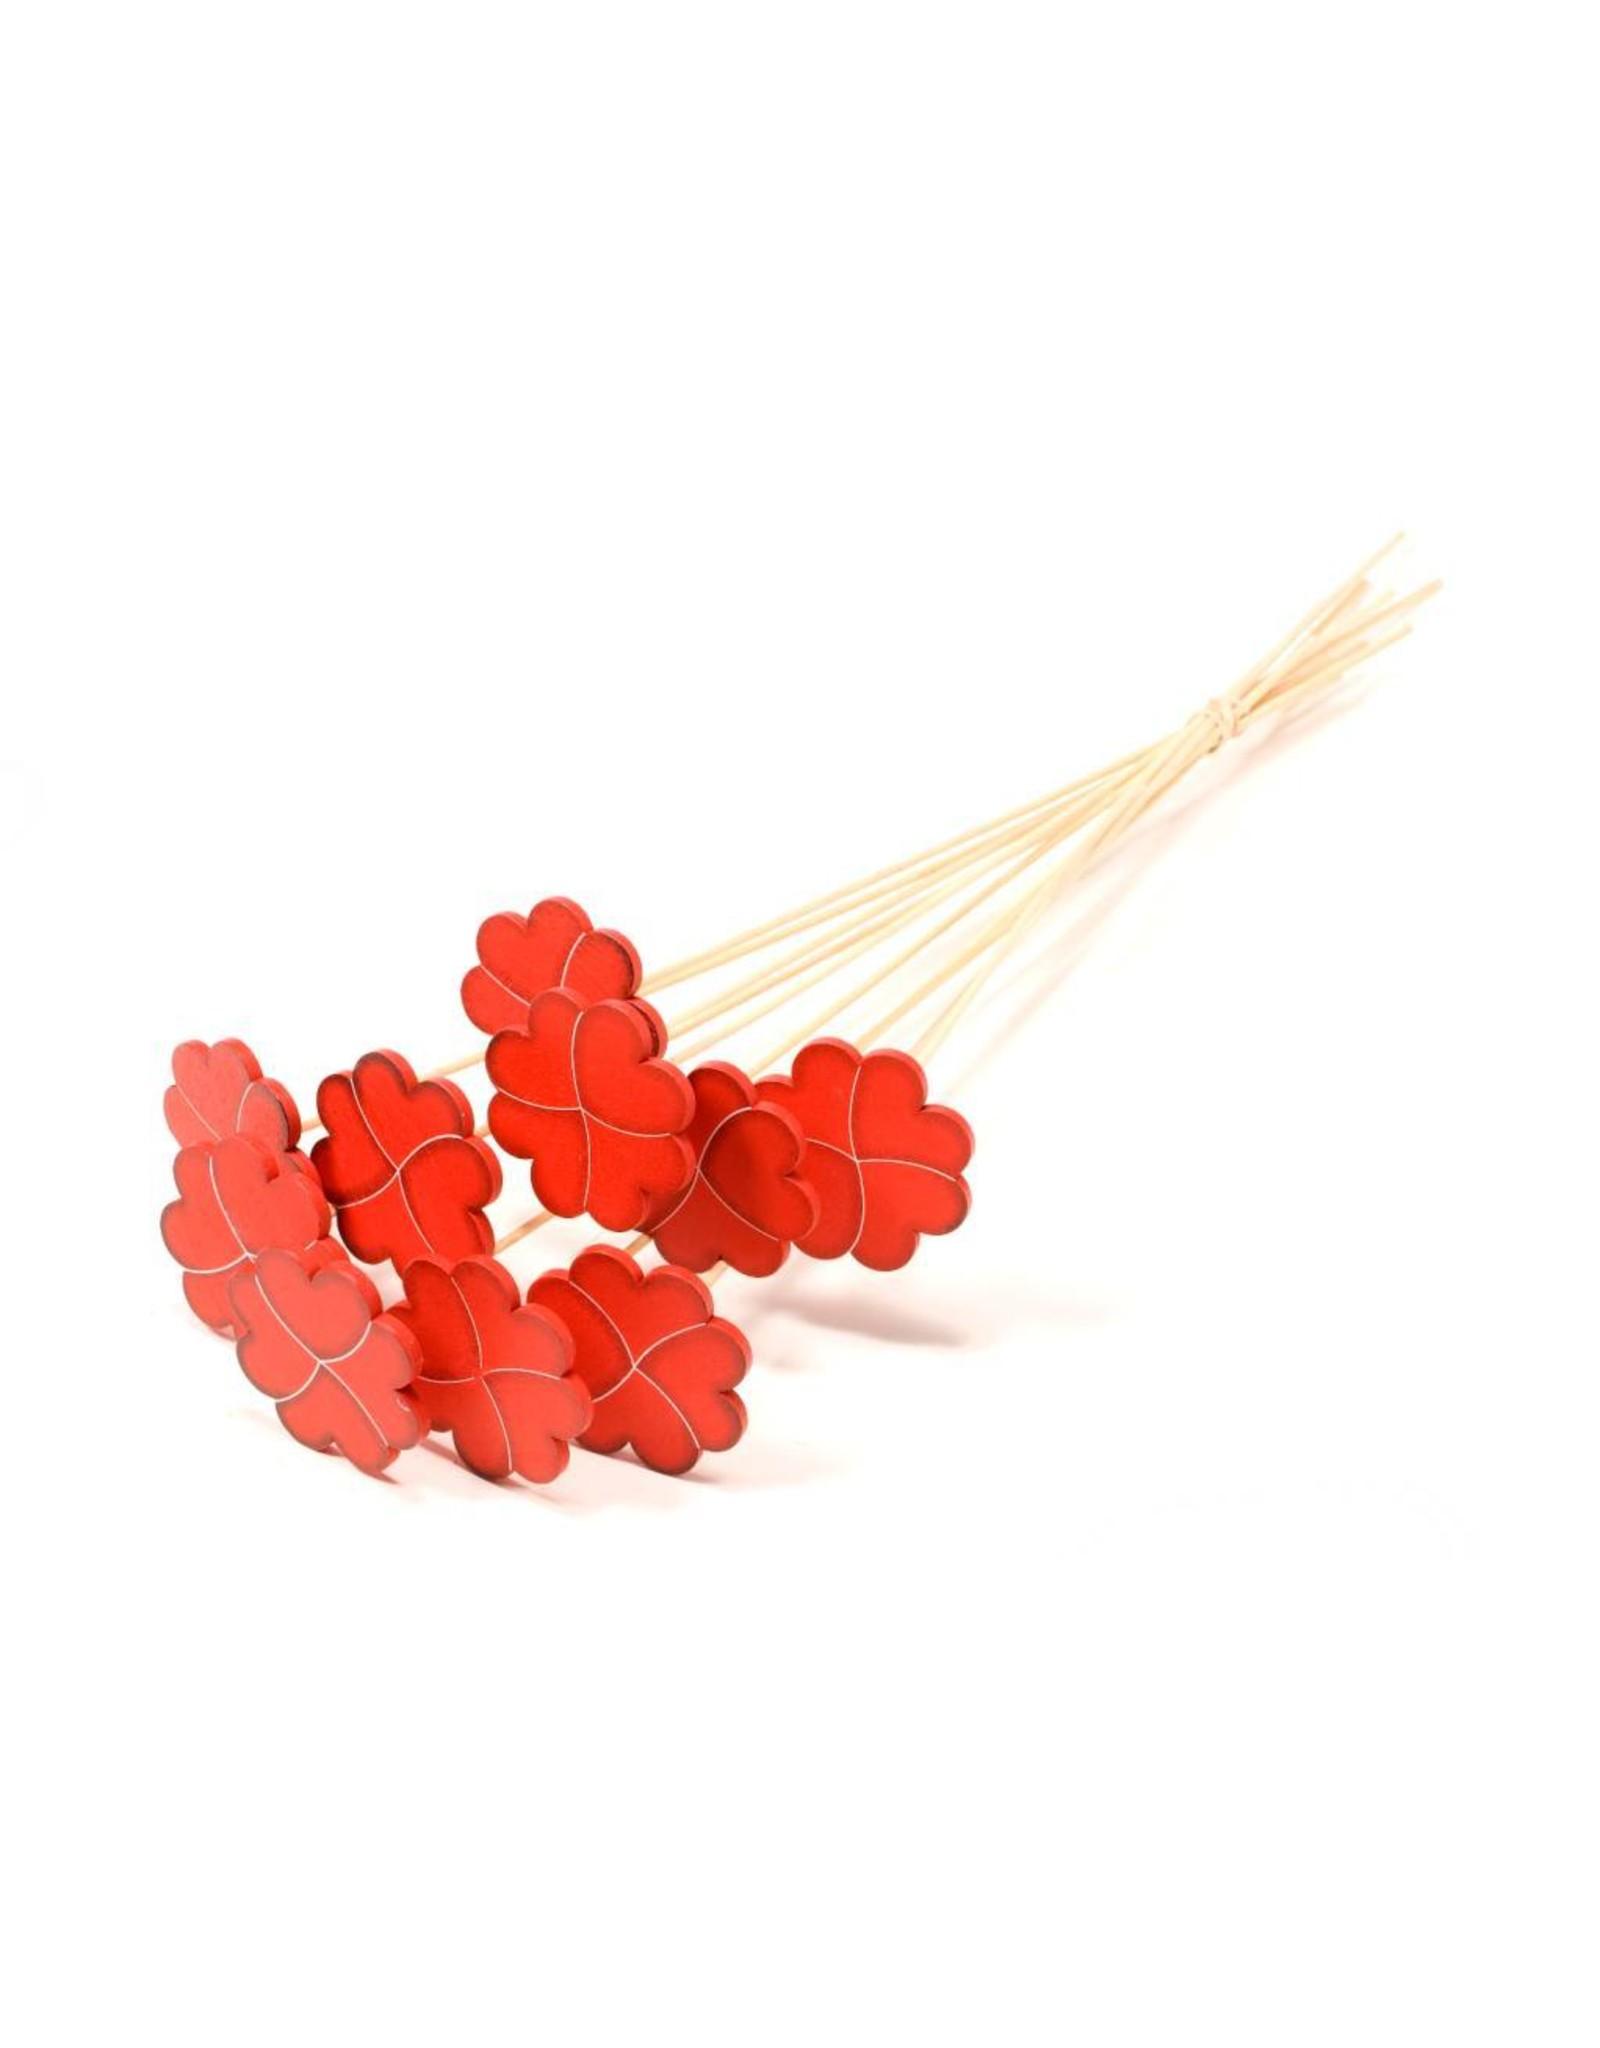 Heart clover 7cm wood flat on stem 10pc SB red x 3